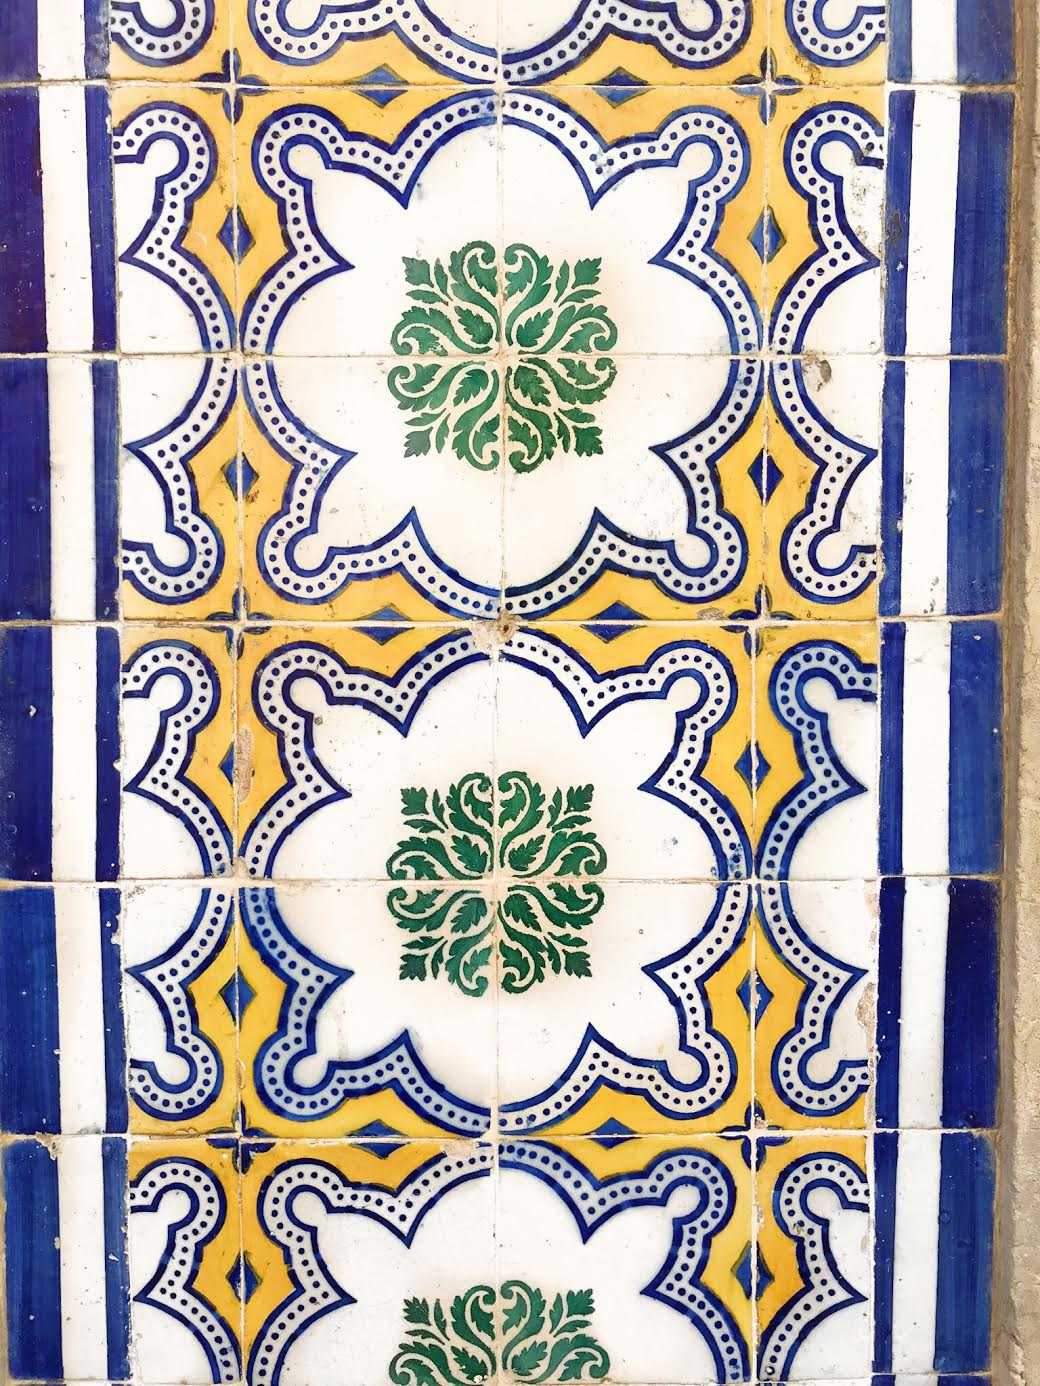 Muslim-travel-guide-Lisbon-tiles